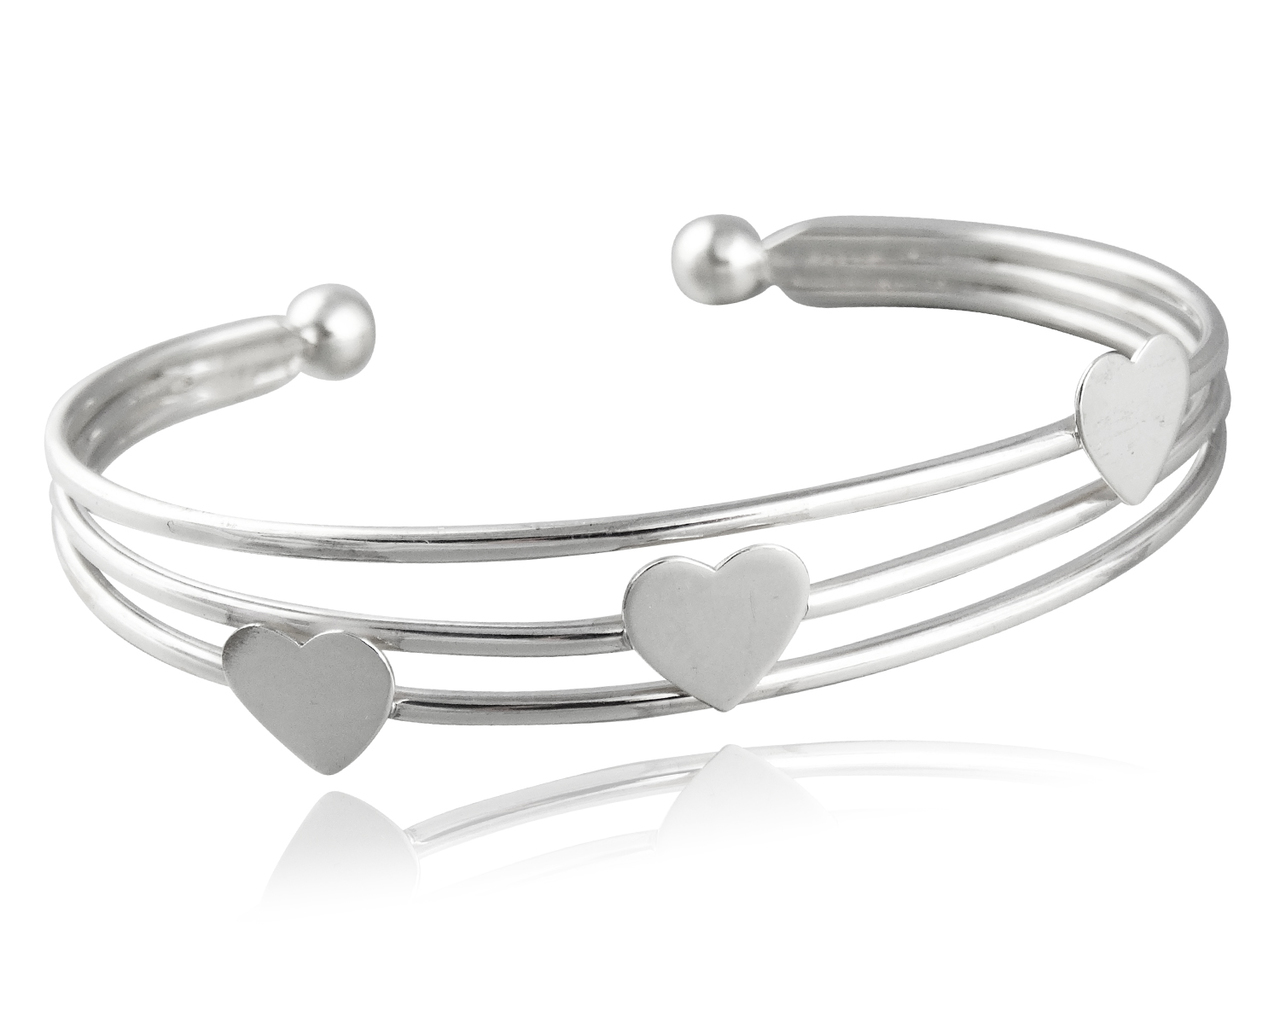 Three Hearts Cuff BANGLE Bracelet - 925 Sterling Silver Adjustable